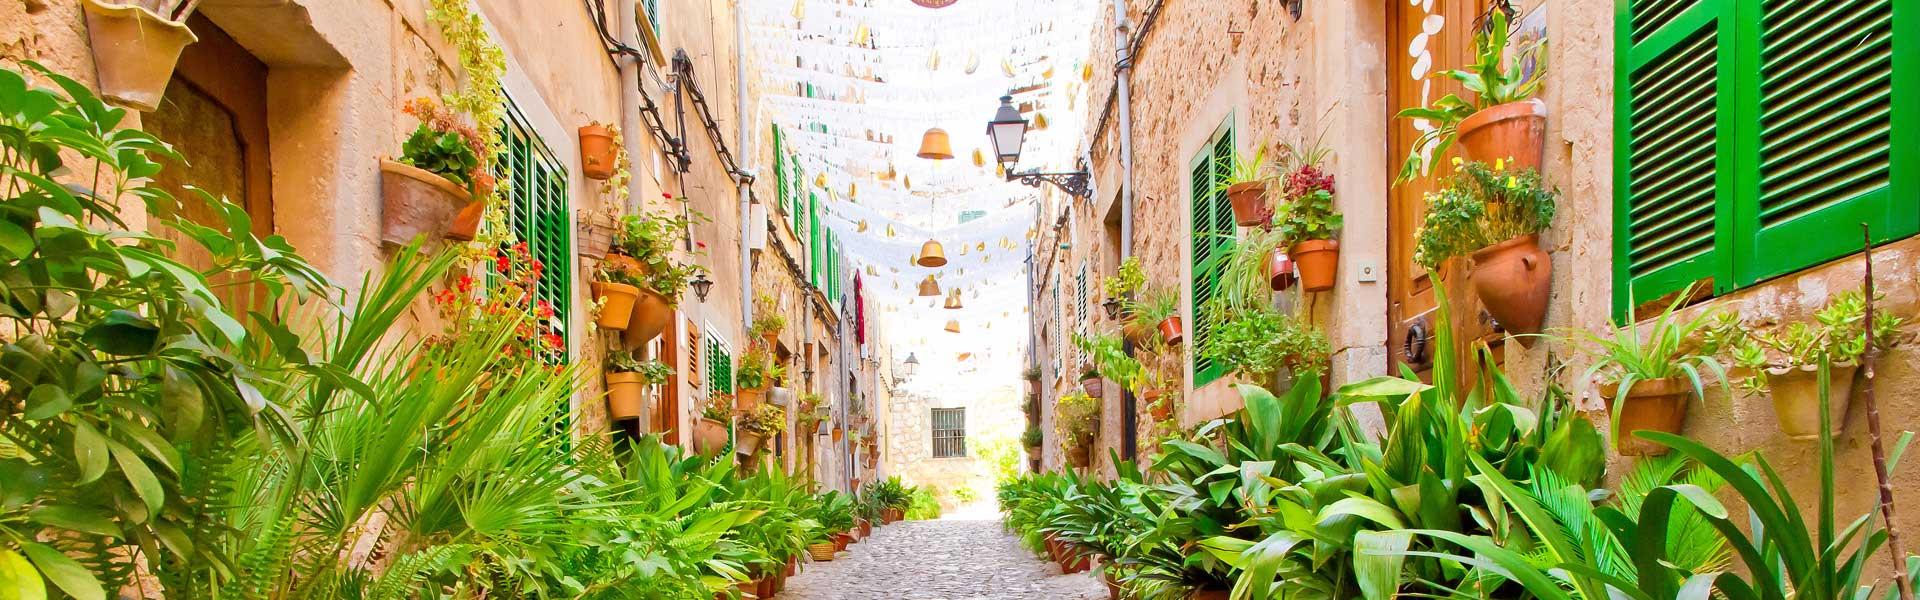 Hausfassaden in Mallorca